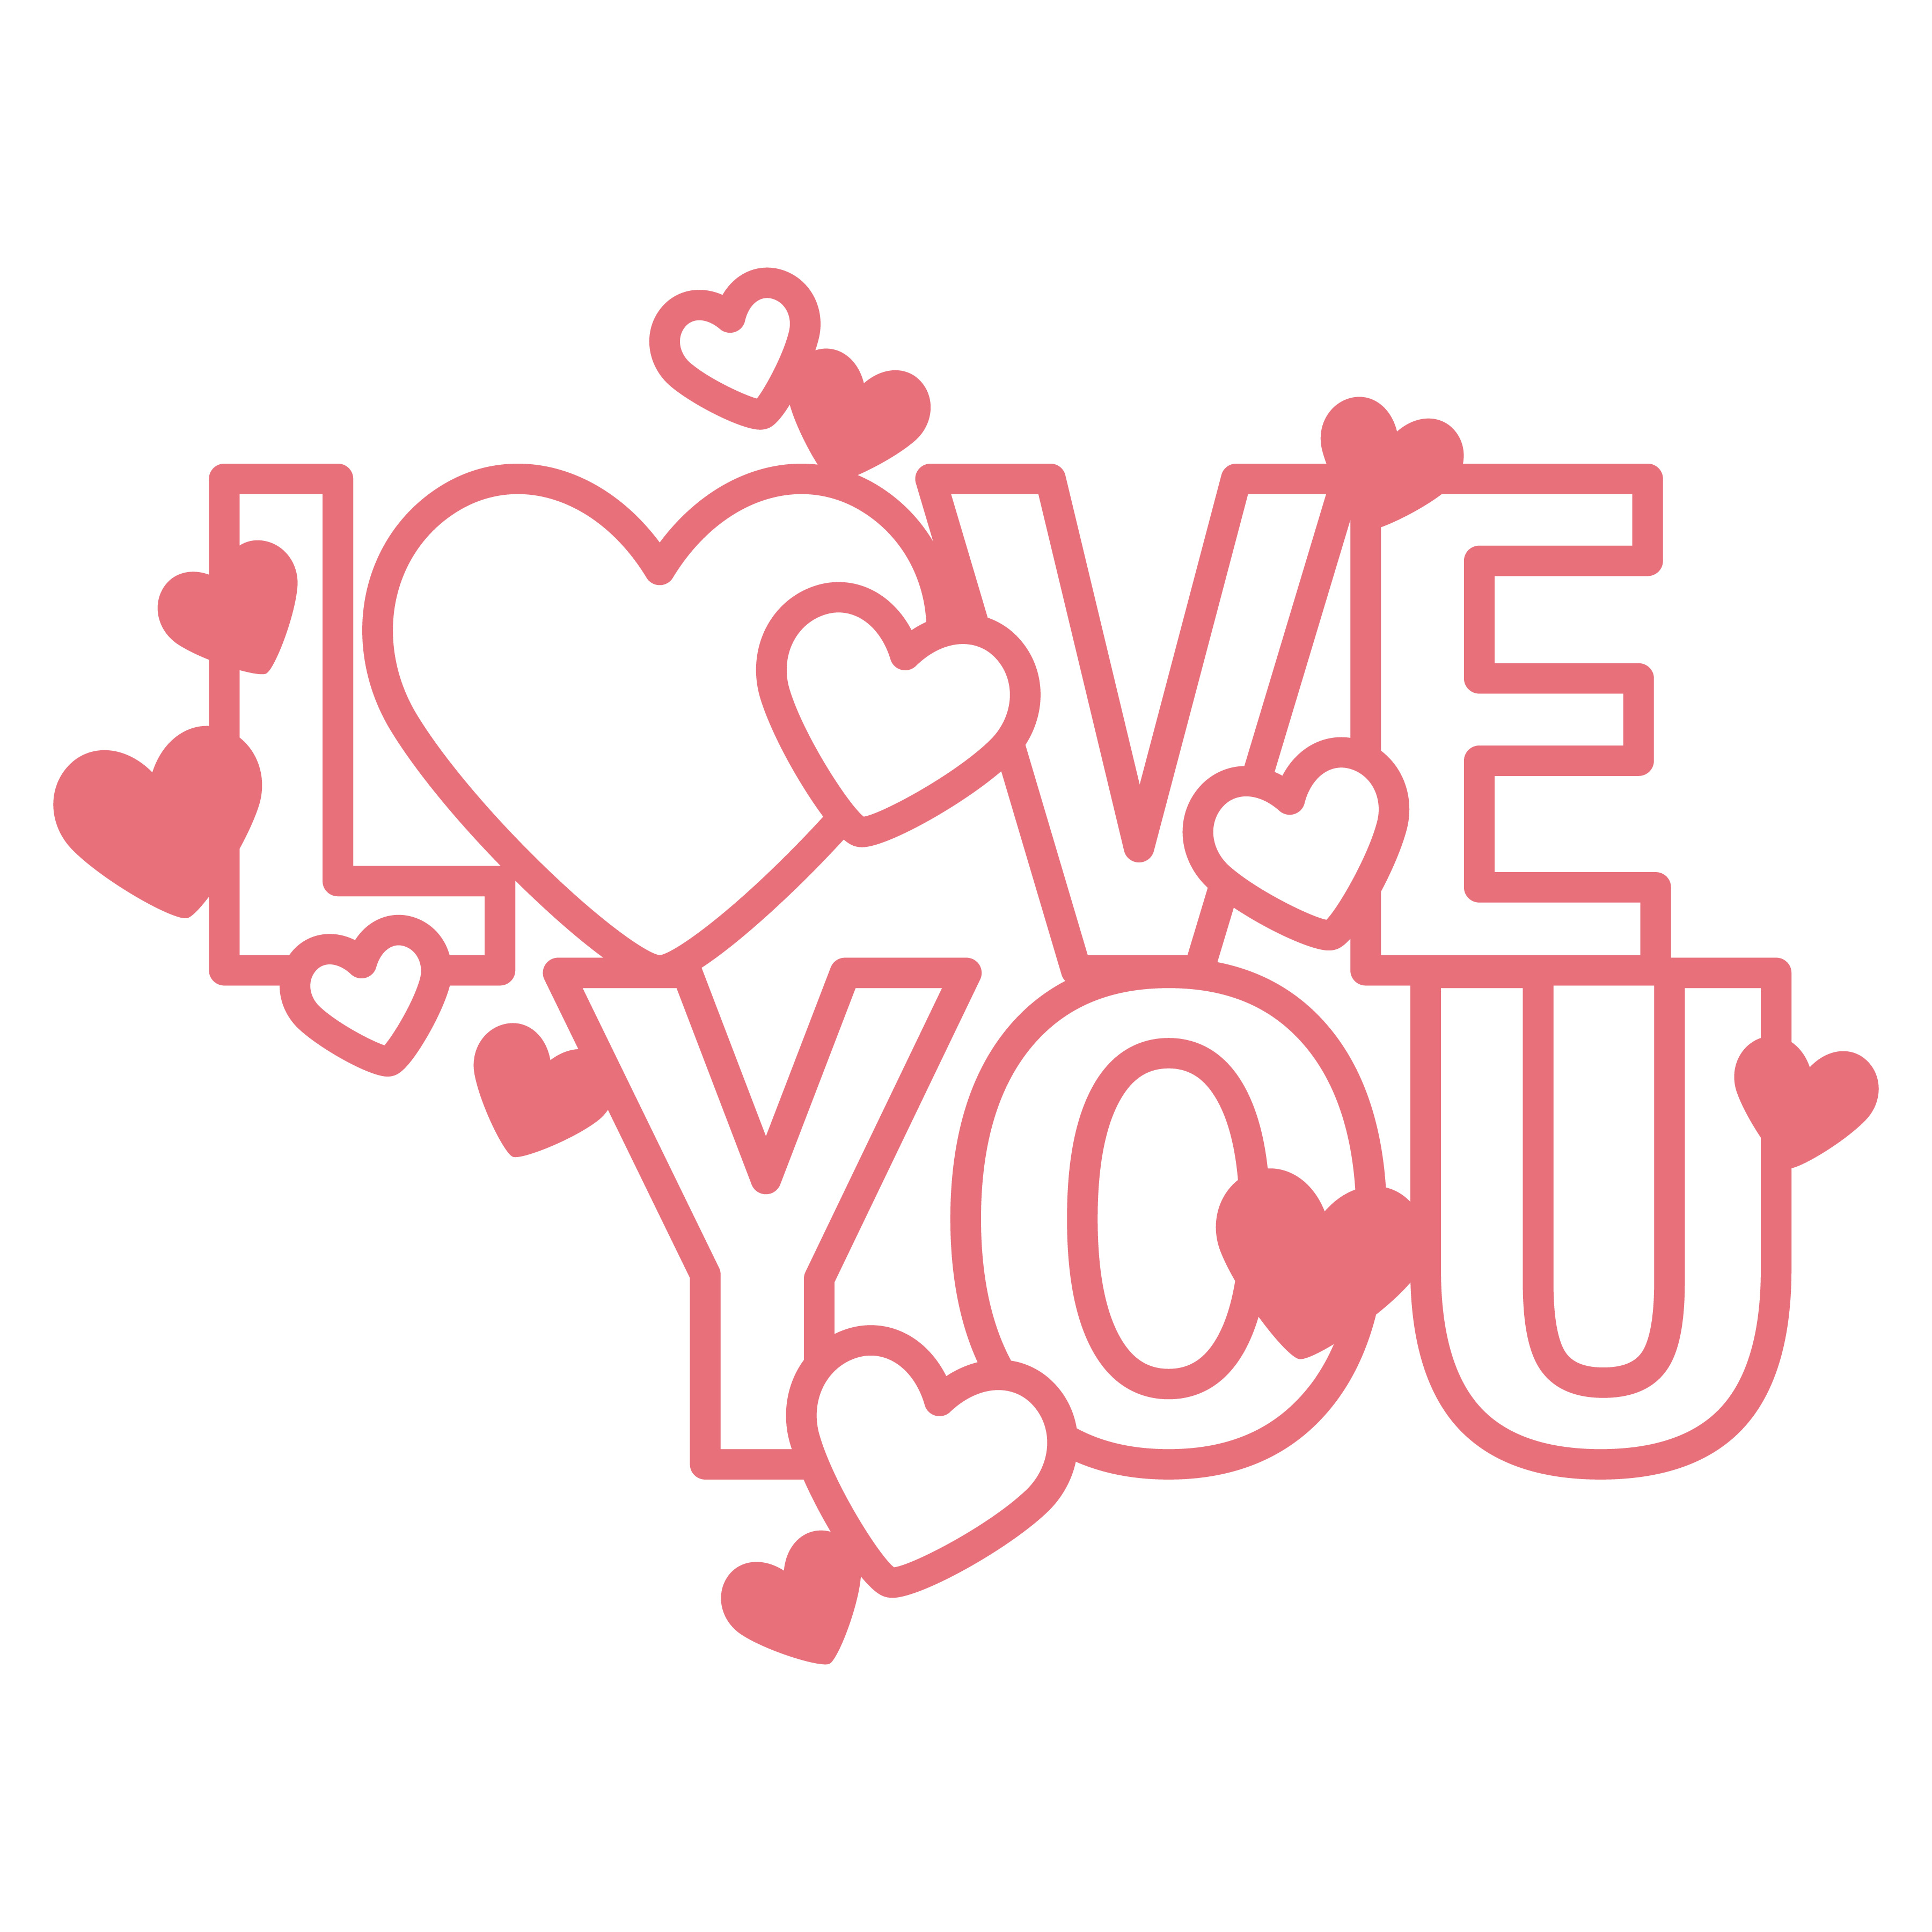 Love heart Free SVG